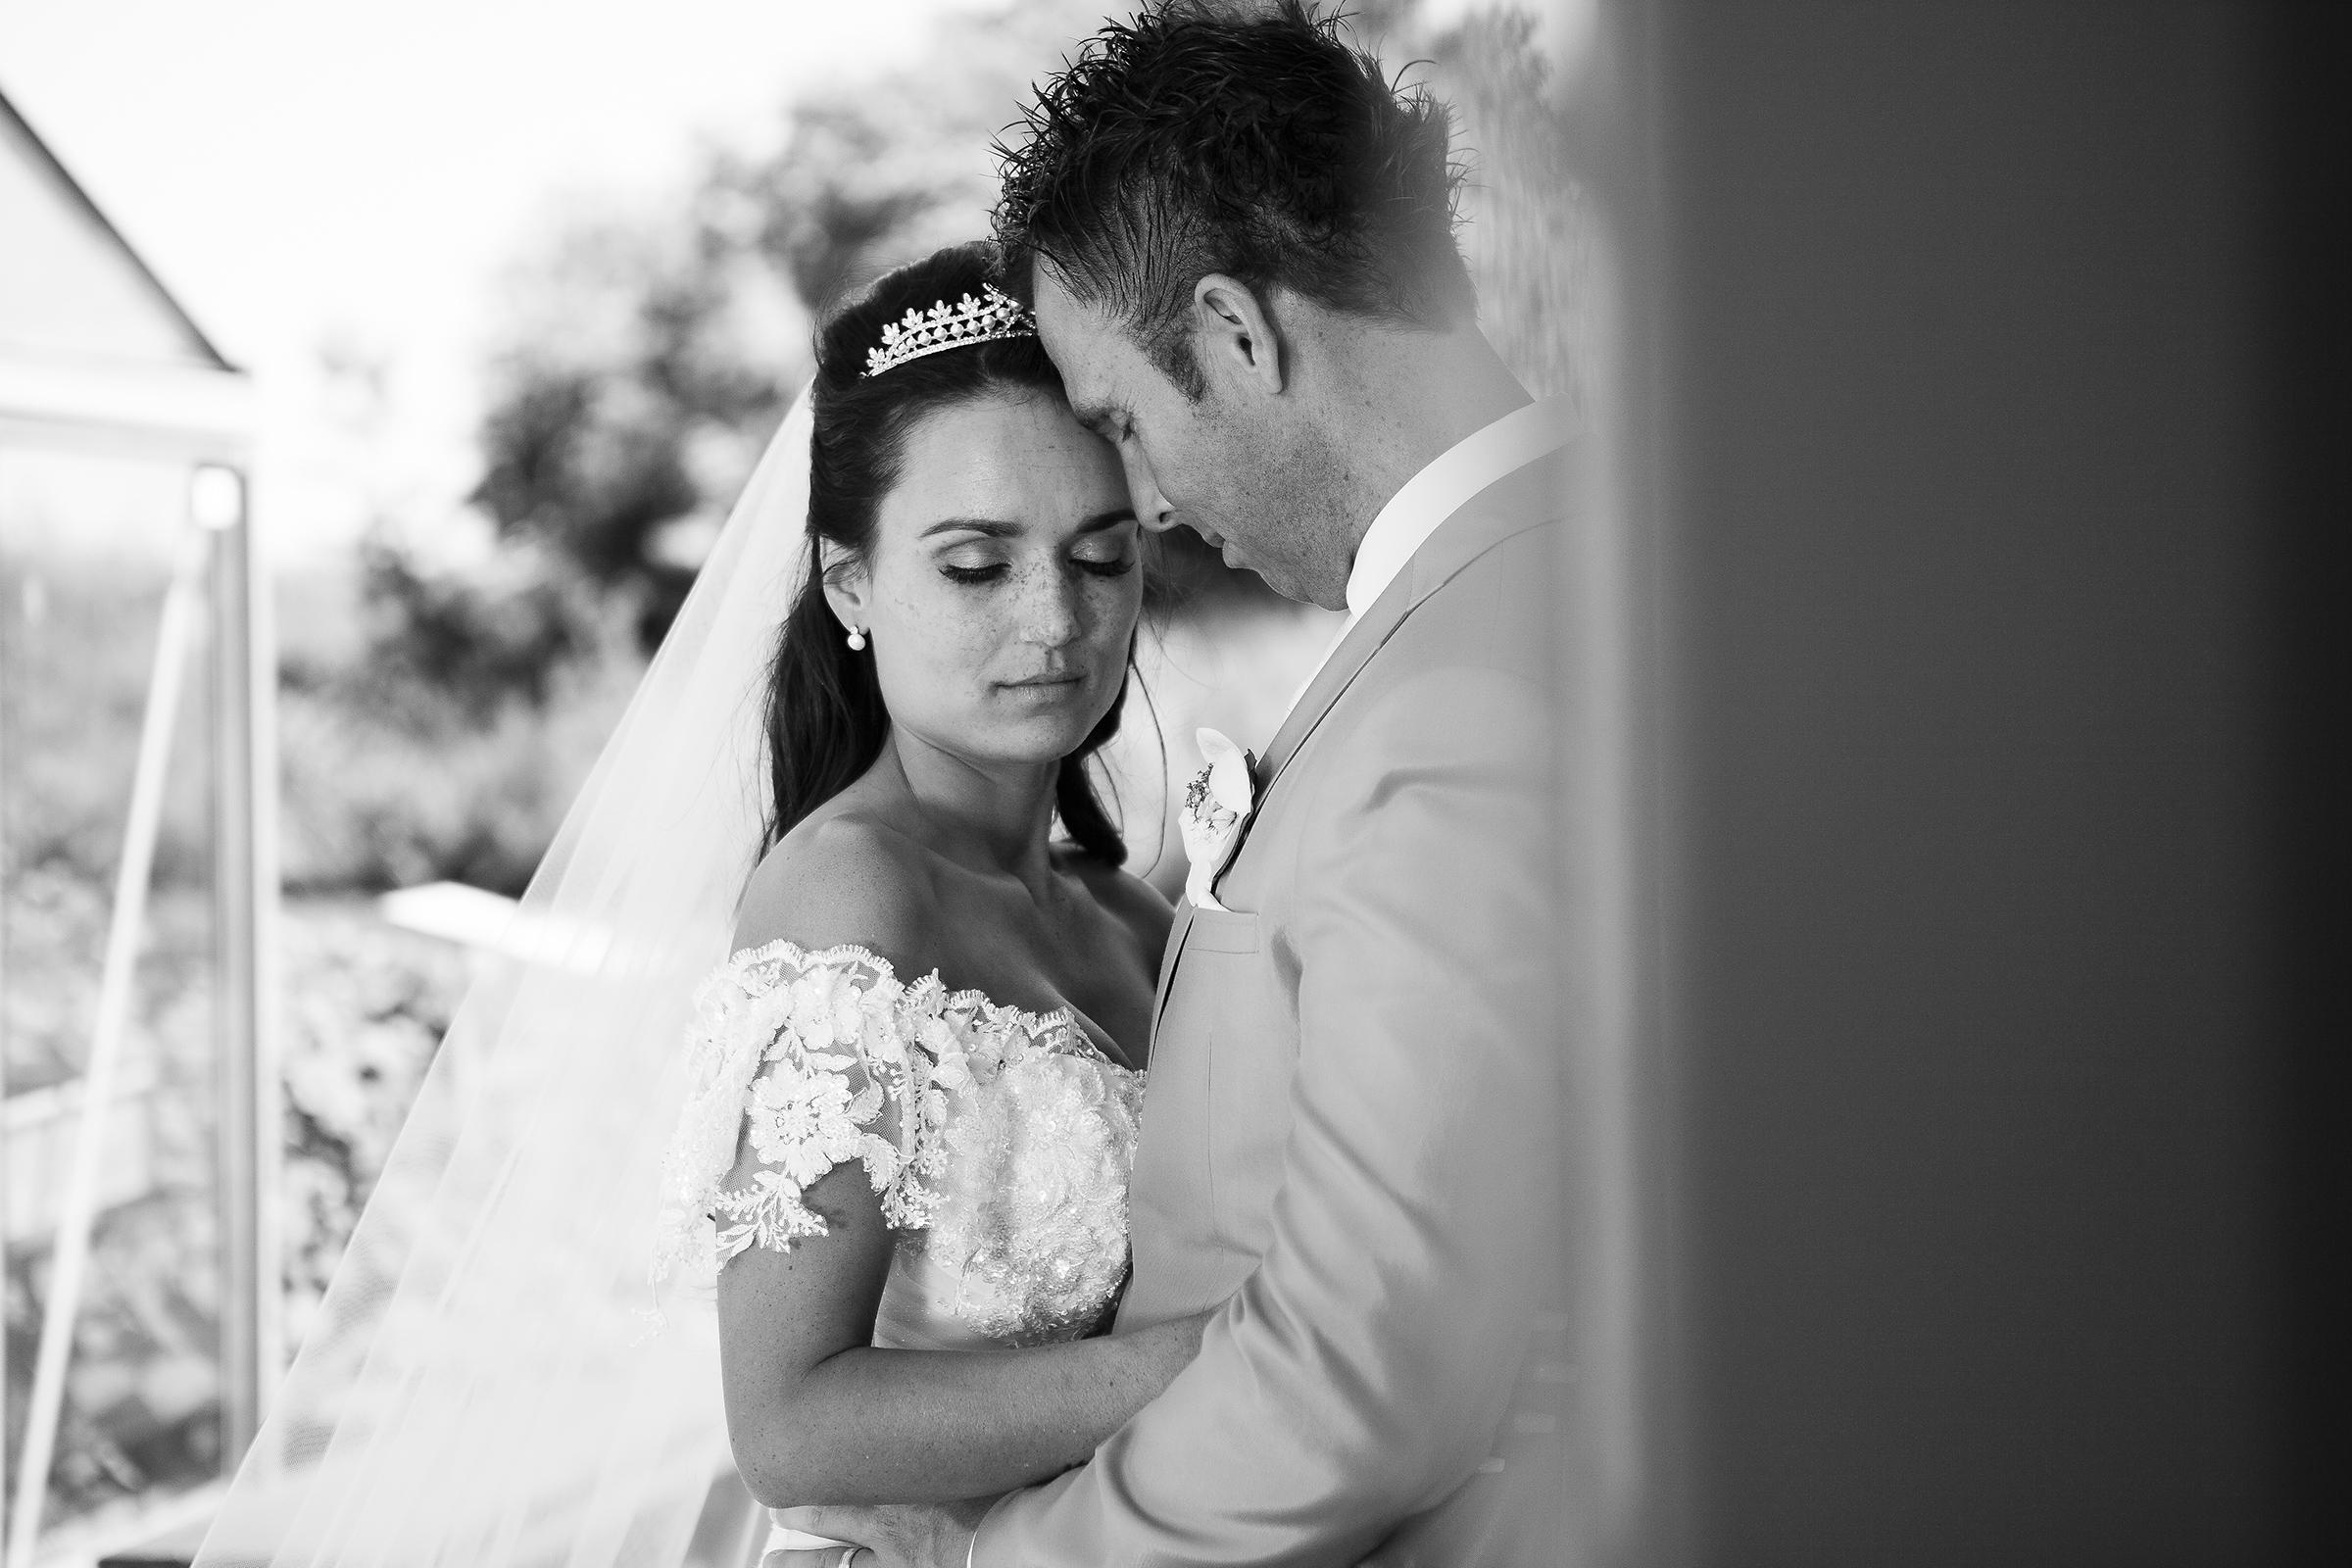 Bas-Driessen-Fotografie-Rob-en-Dewy-bruidsreportage-1